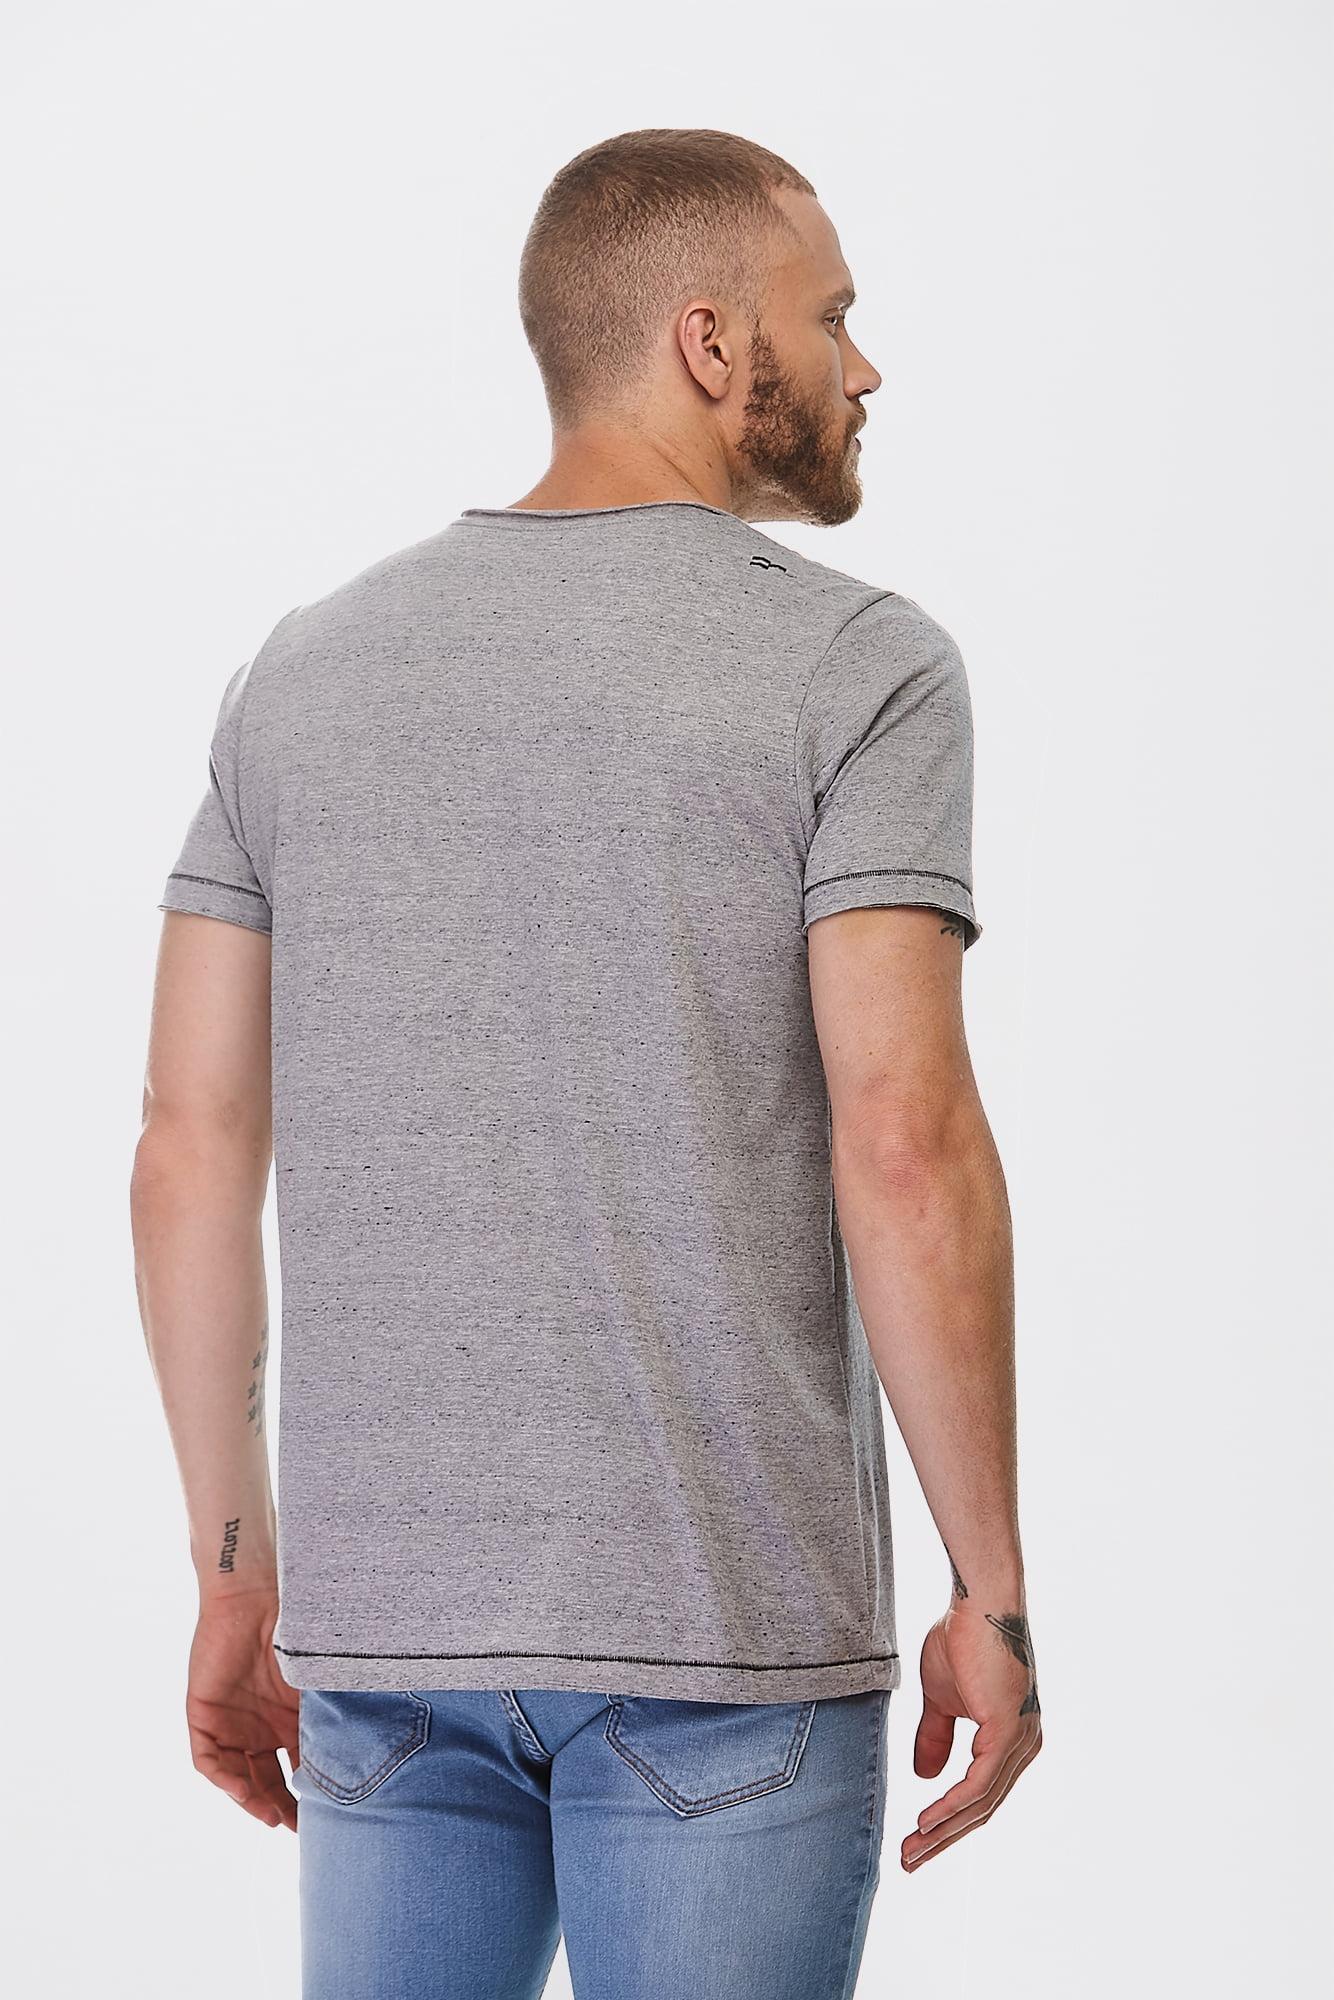 Camiseta Cinza Dreamer